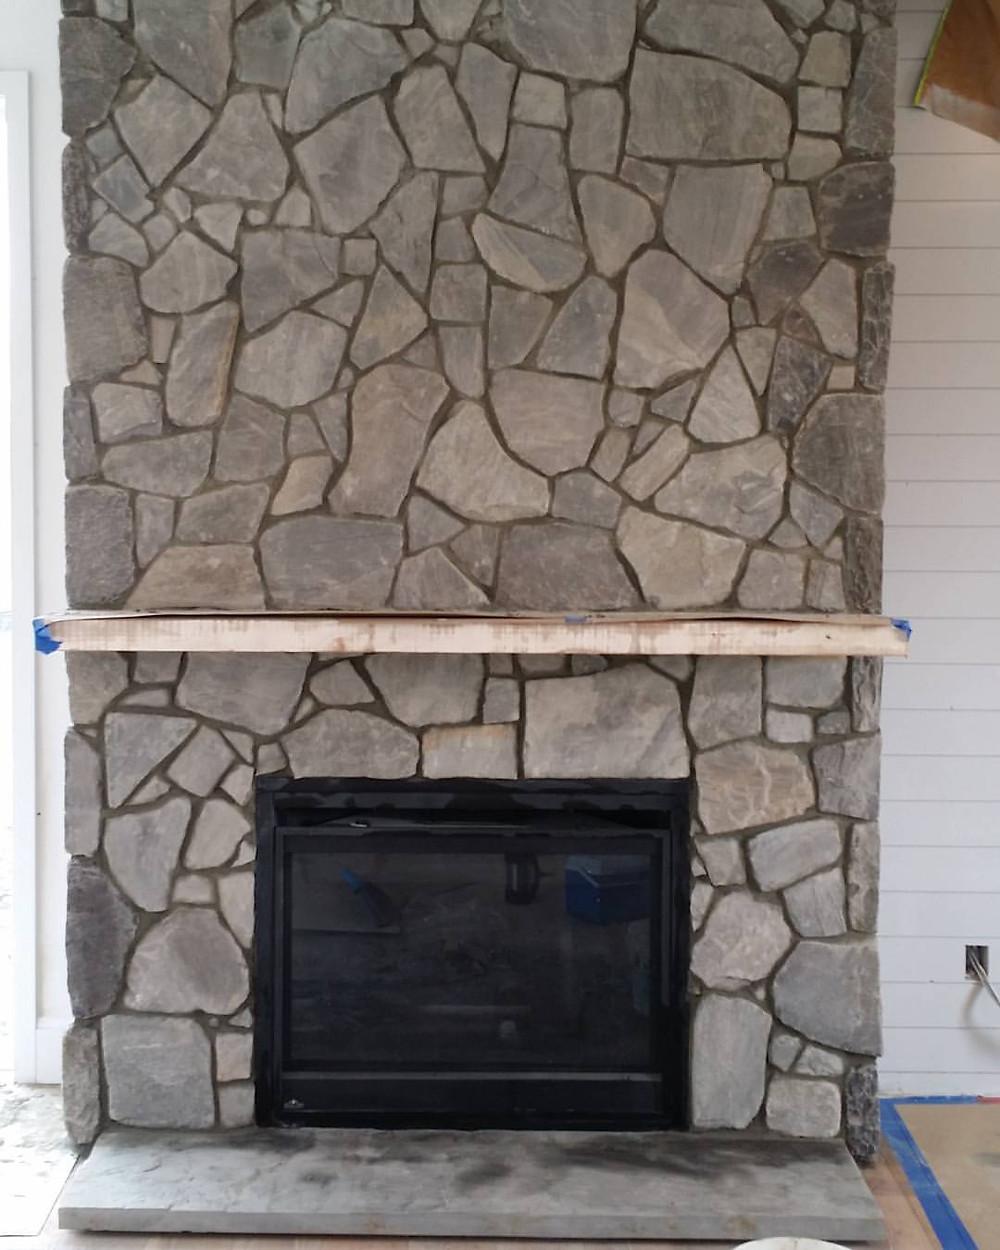 Lennox Masonry, Masonry Contractor, Stone Mason, Victoria BC, Vancouver Island - Natural Stone Veneer, Pangea Fieldstone